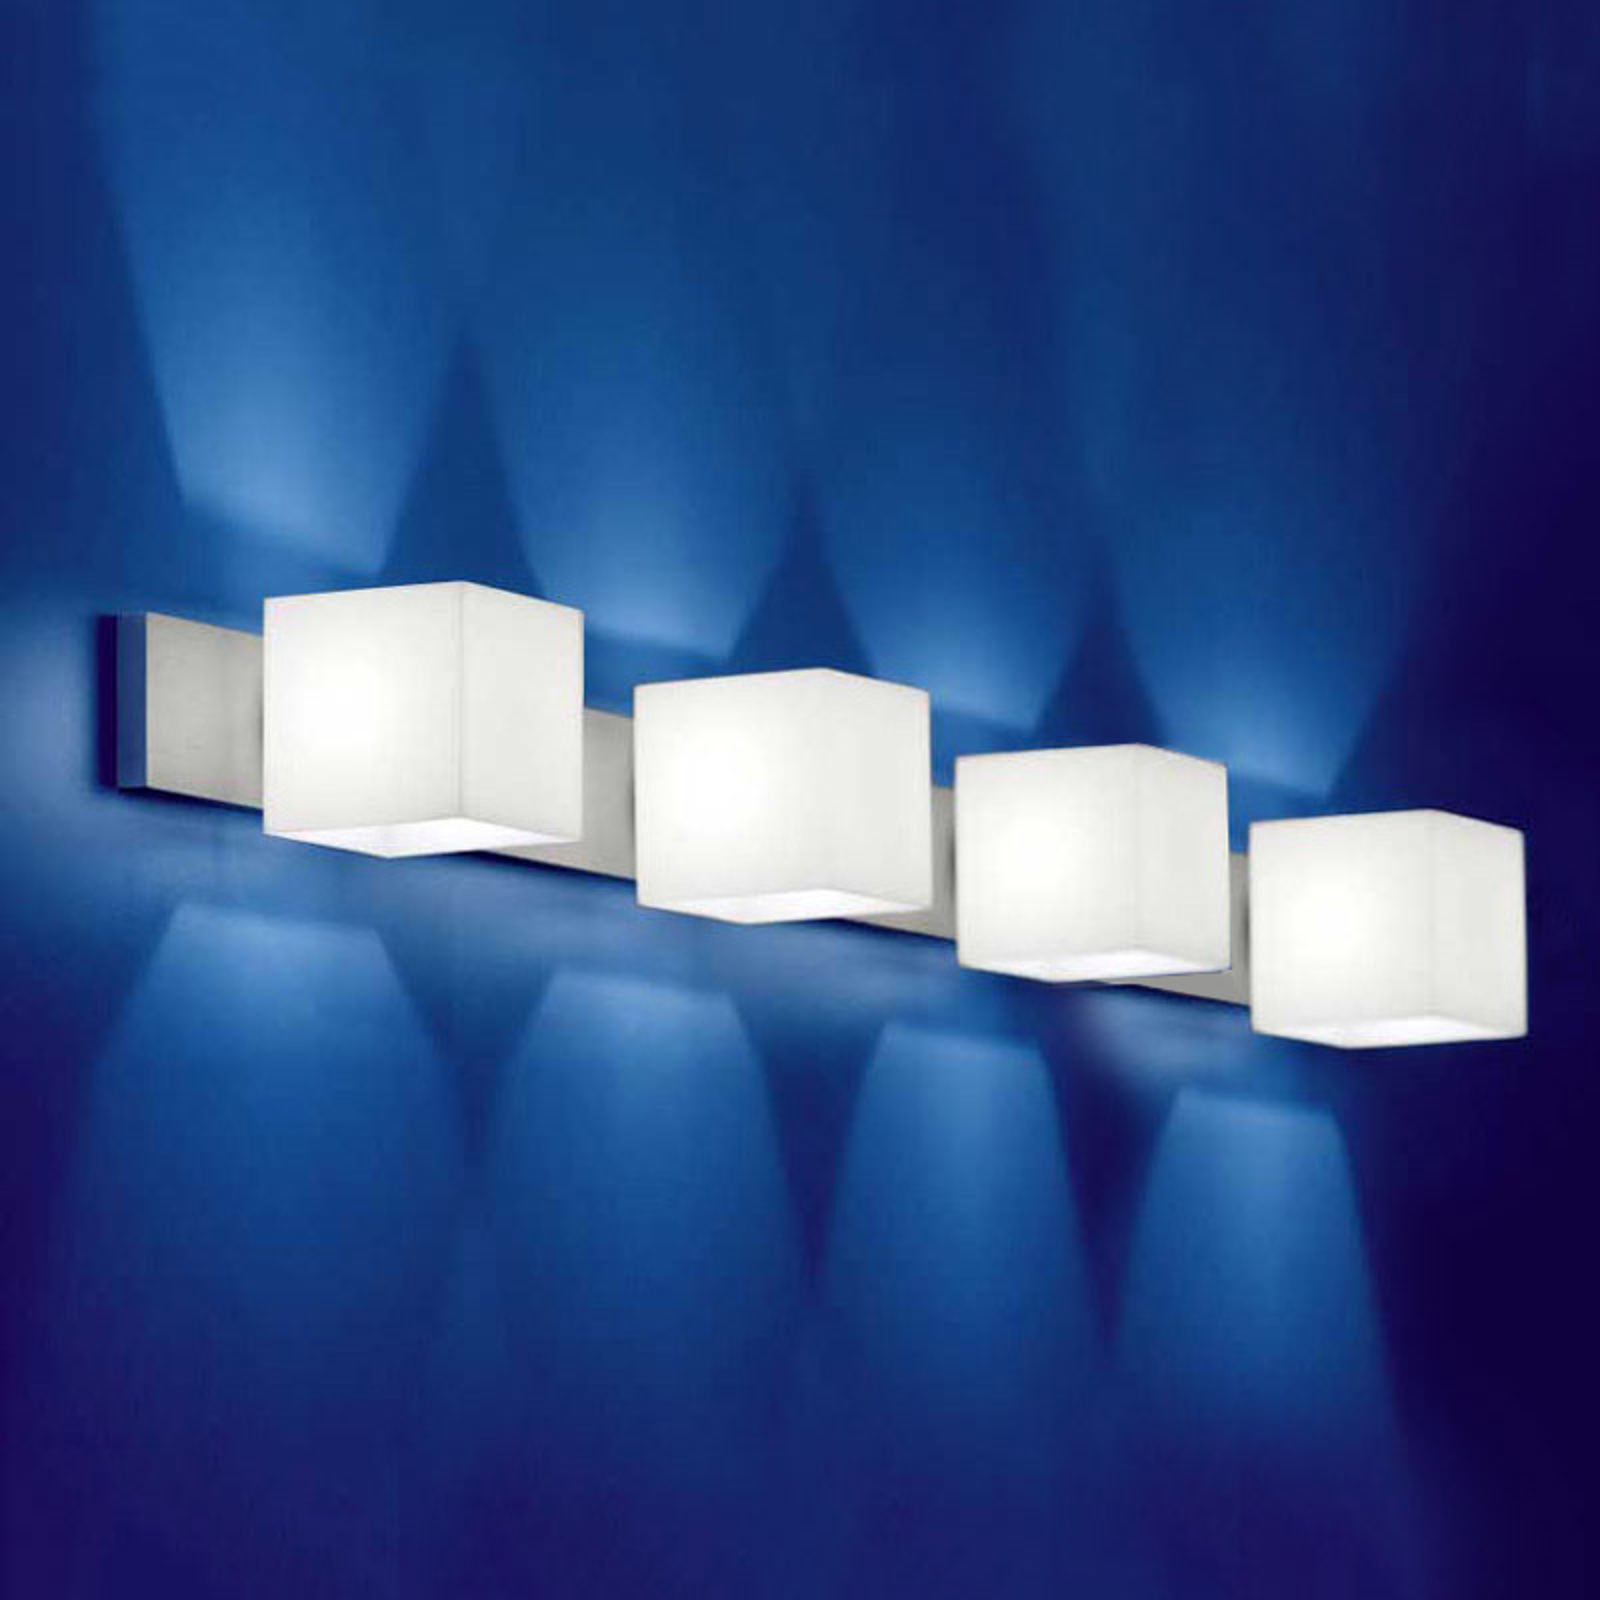 Casablanca Cube Wandlampe, vierflammig